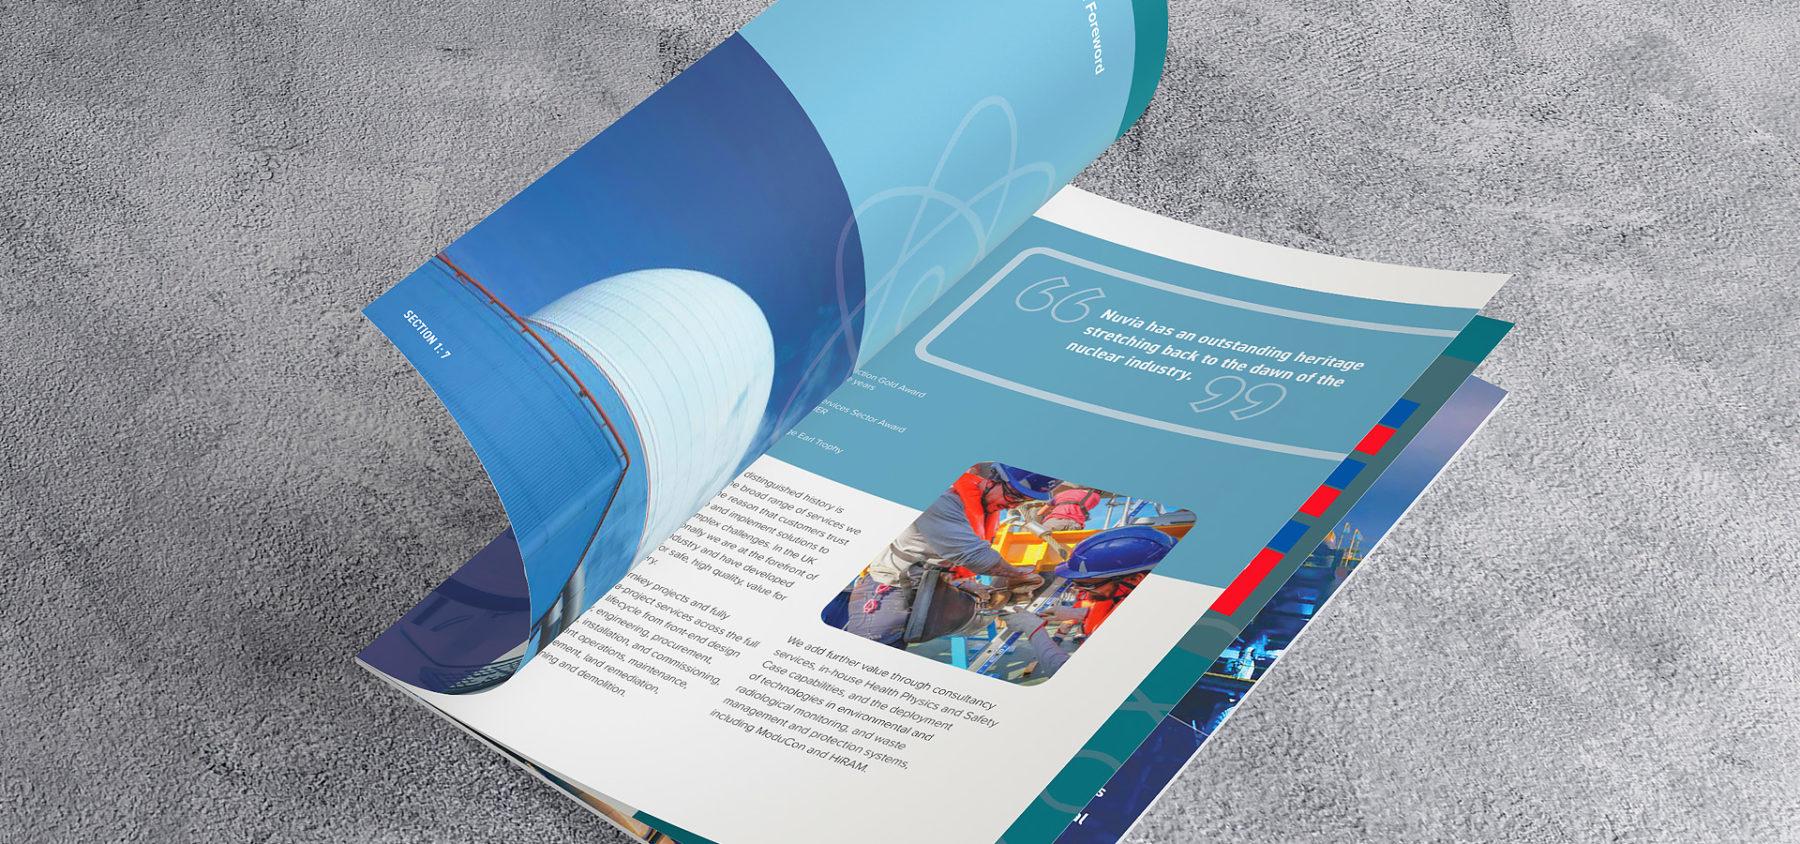 Nuvia brochure